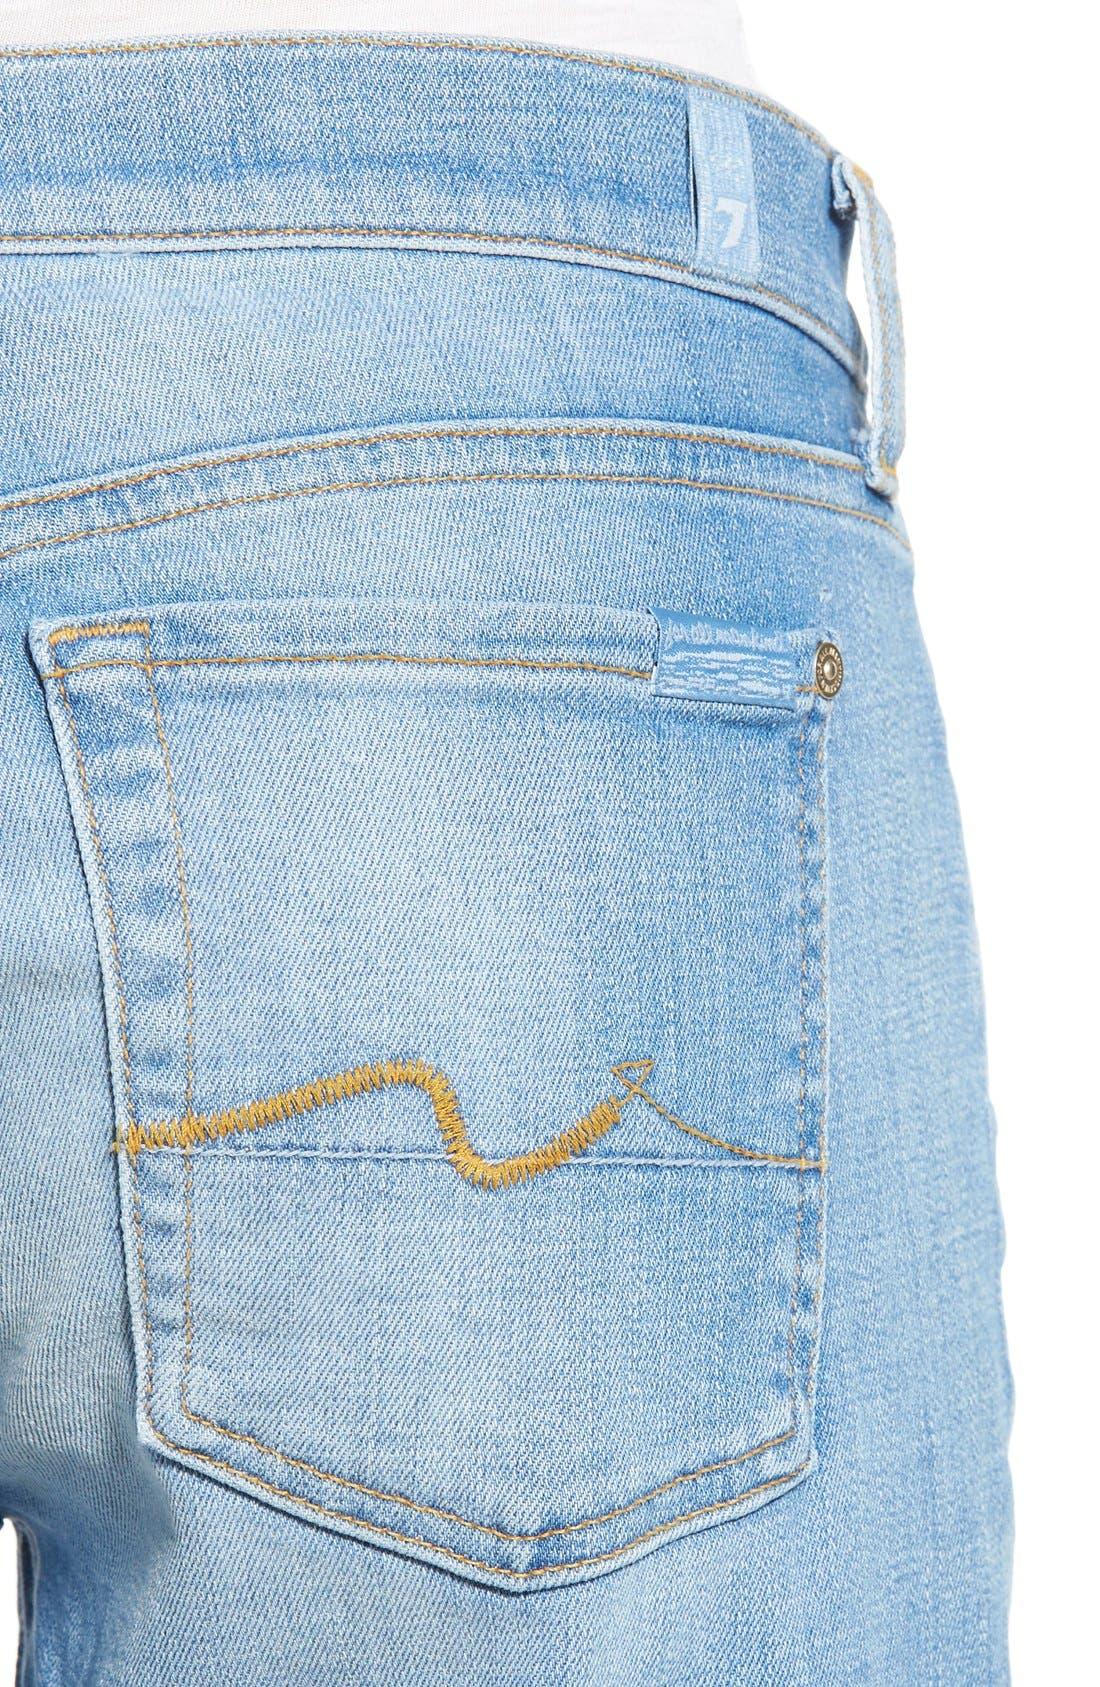 Alternate Image 4  - 7 For All Mankind® 'Josefina' Mid Rise Boyfriend Jeans (Mediterranean Sky)